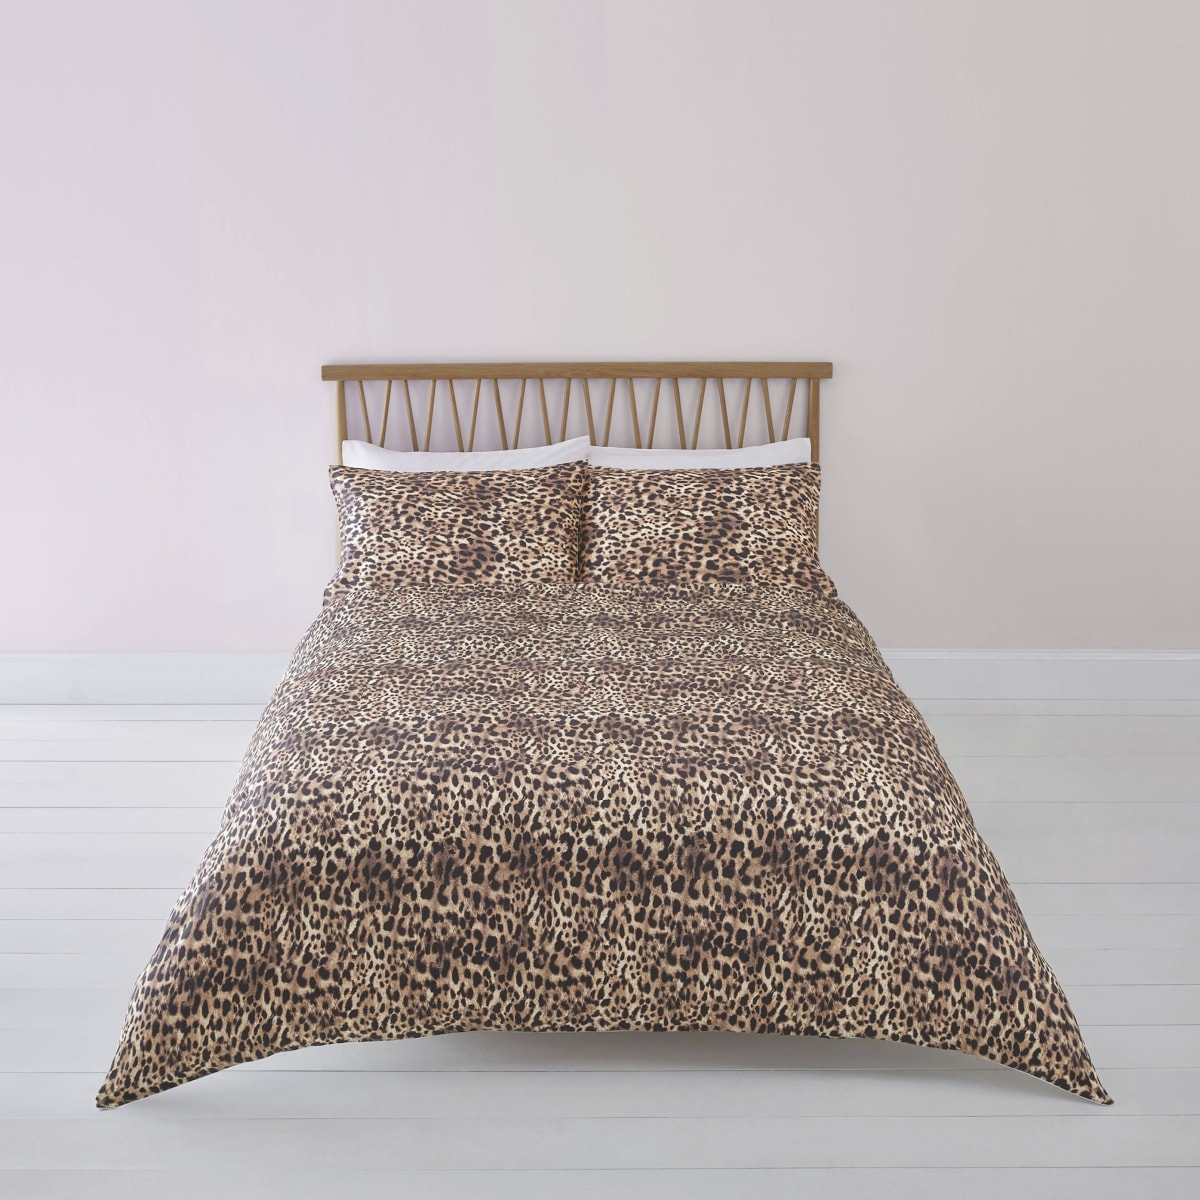 Braune Bettgarnitur mit Leoparden-Print, Kingsize